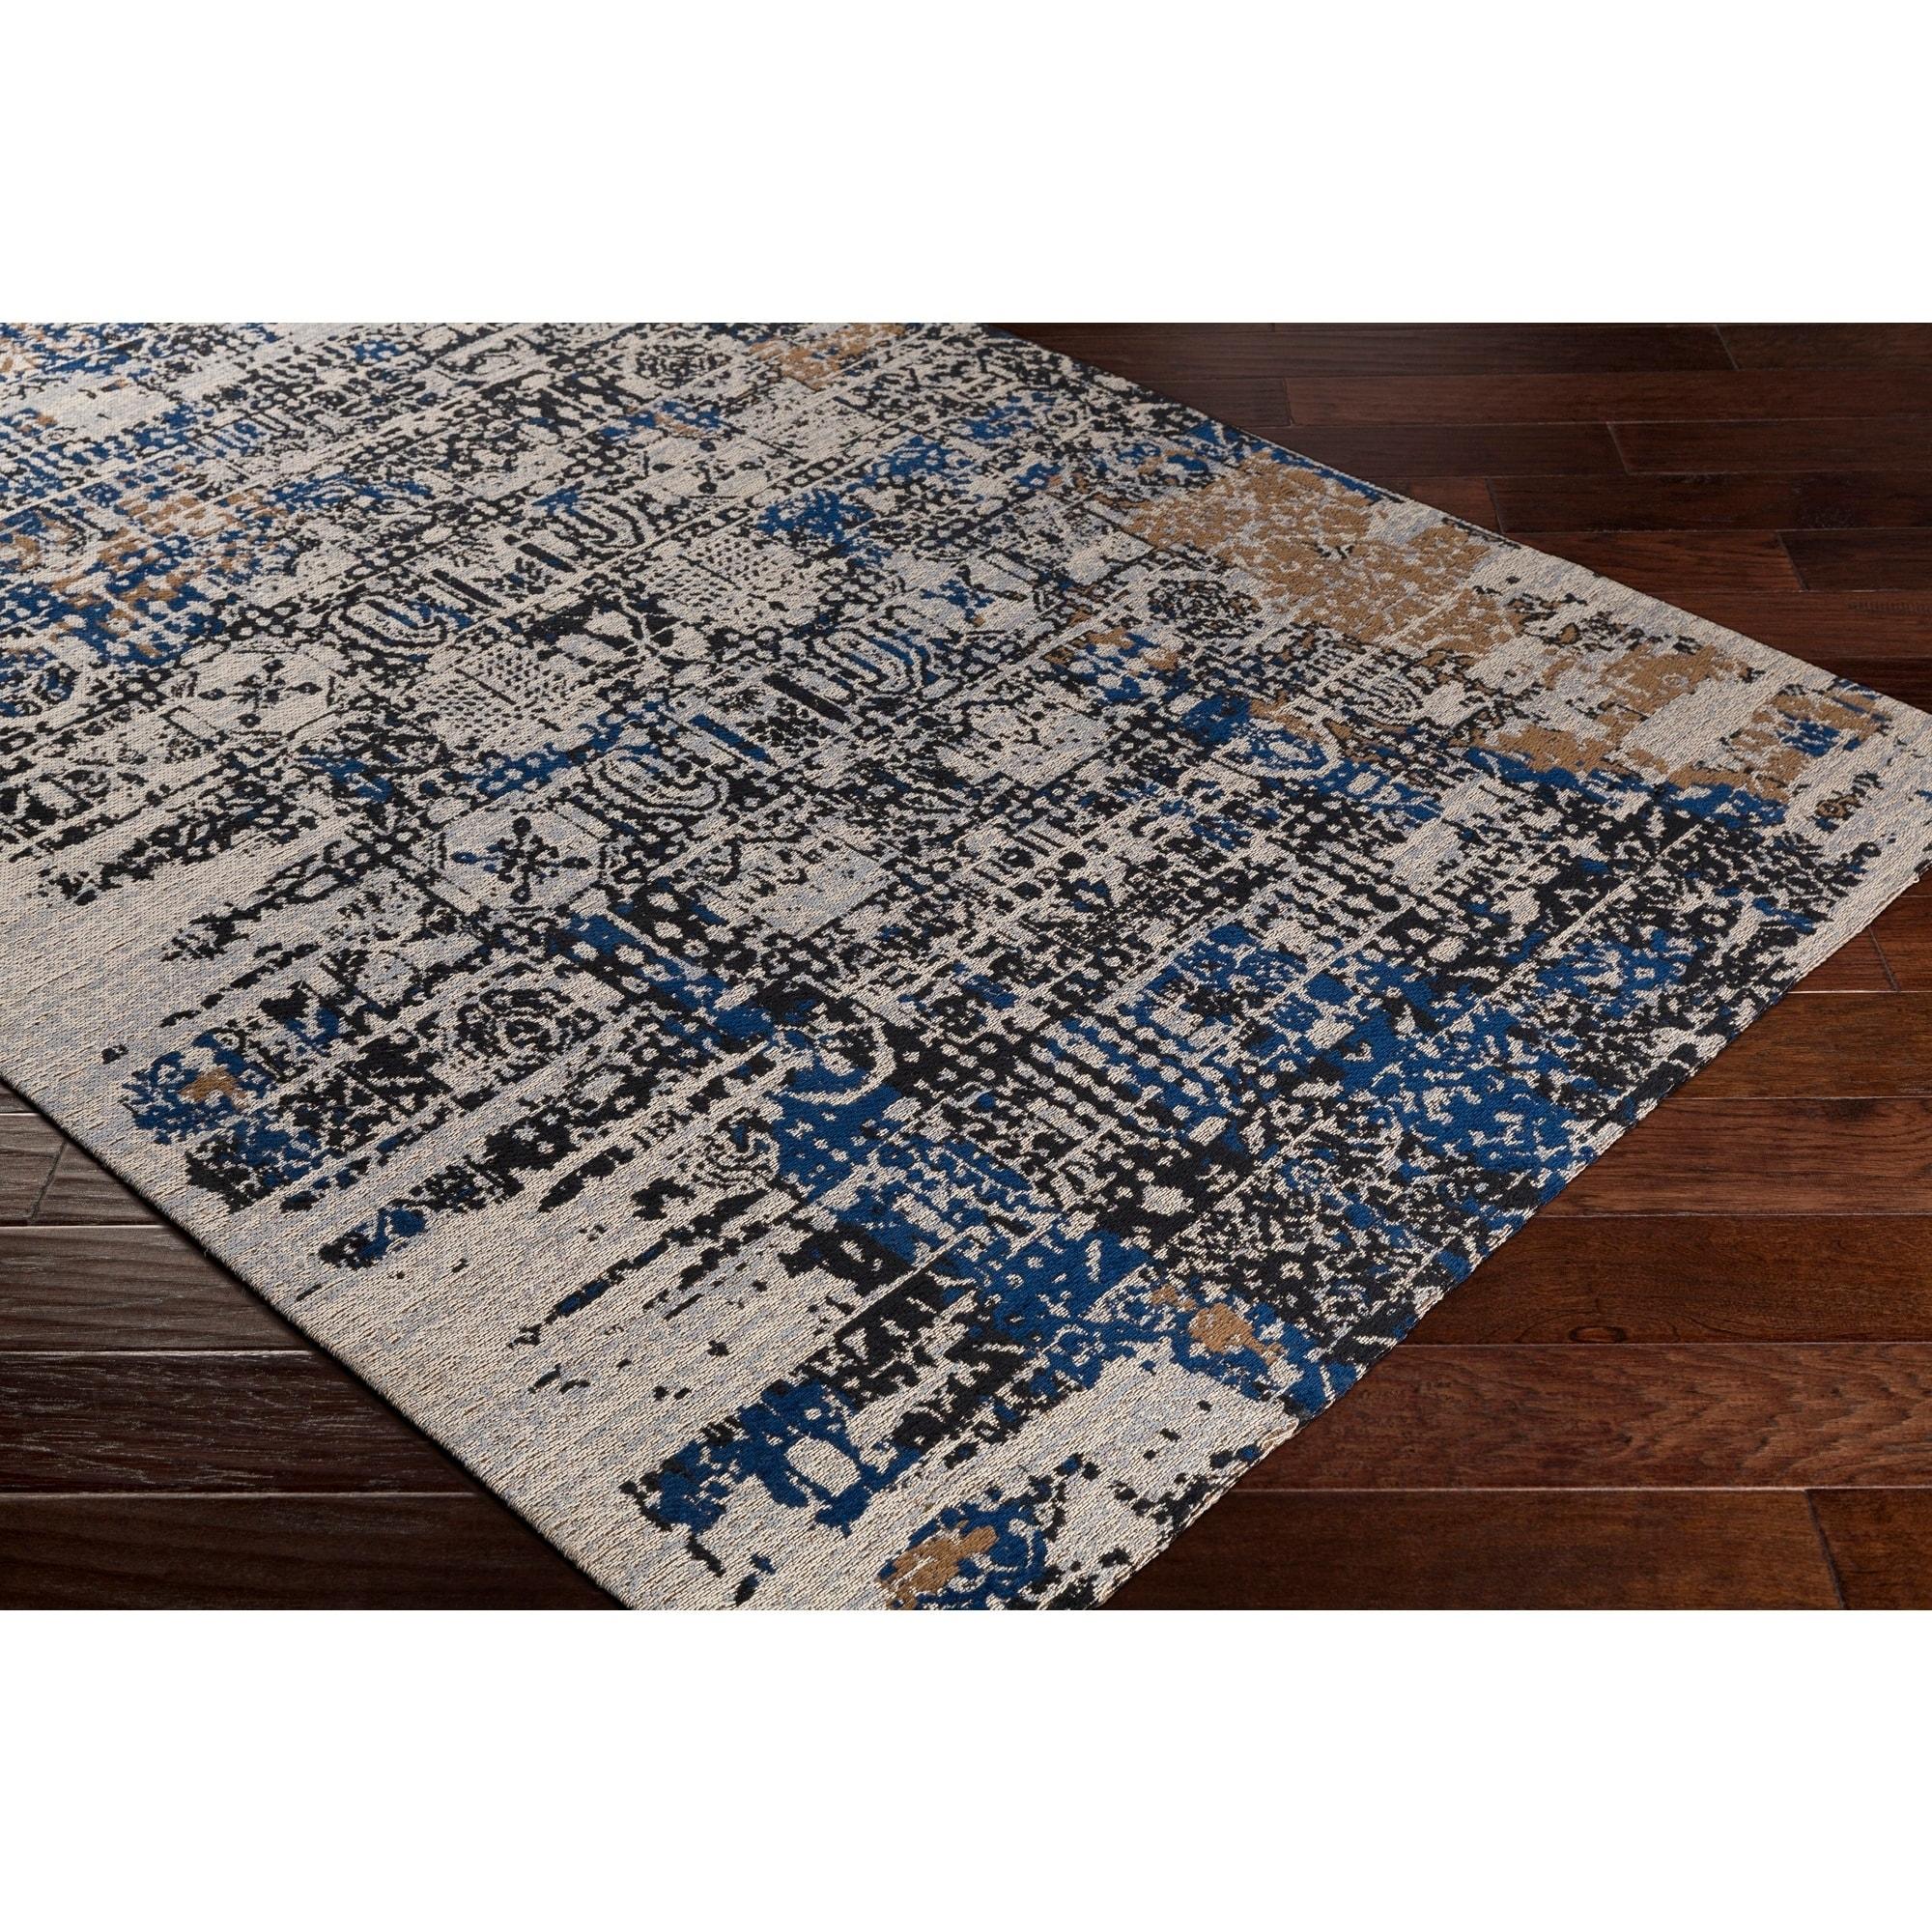 The Persian Carpet Ysis